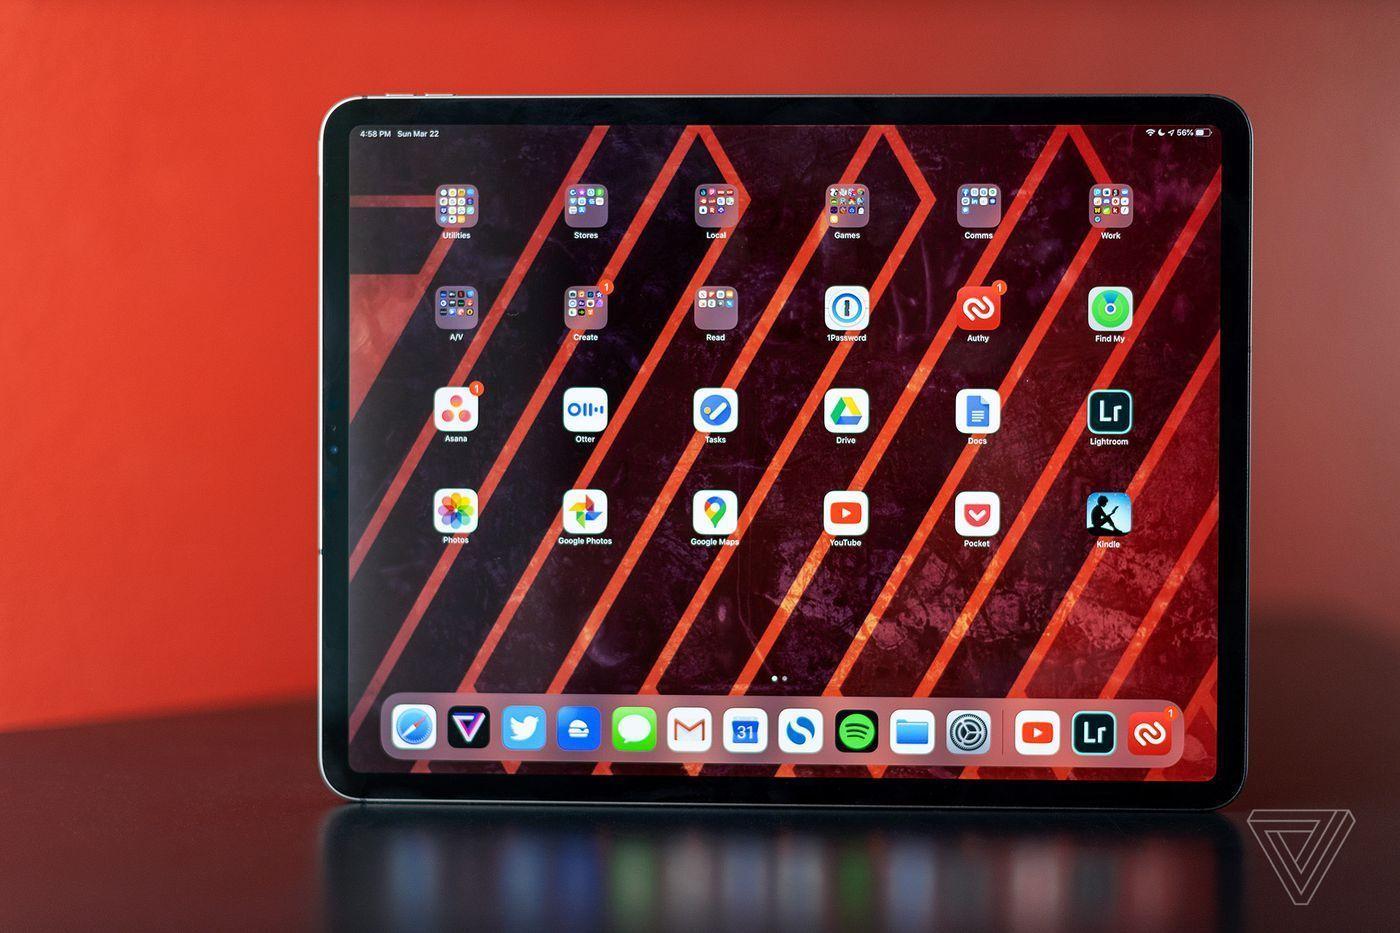 Apple Ipad Pro Review 2020 Trackpad Lidar Wide Angle Camera Ipad Pro Reviews Apple Ipad Ipad Pro